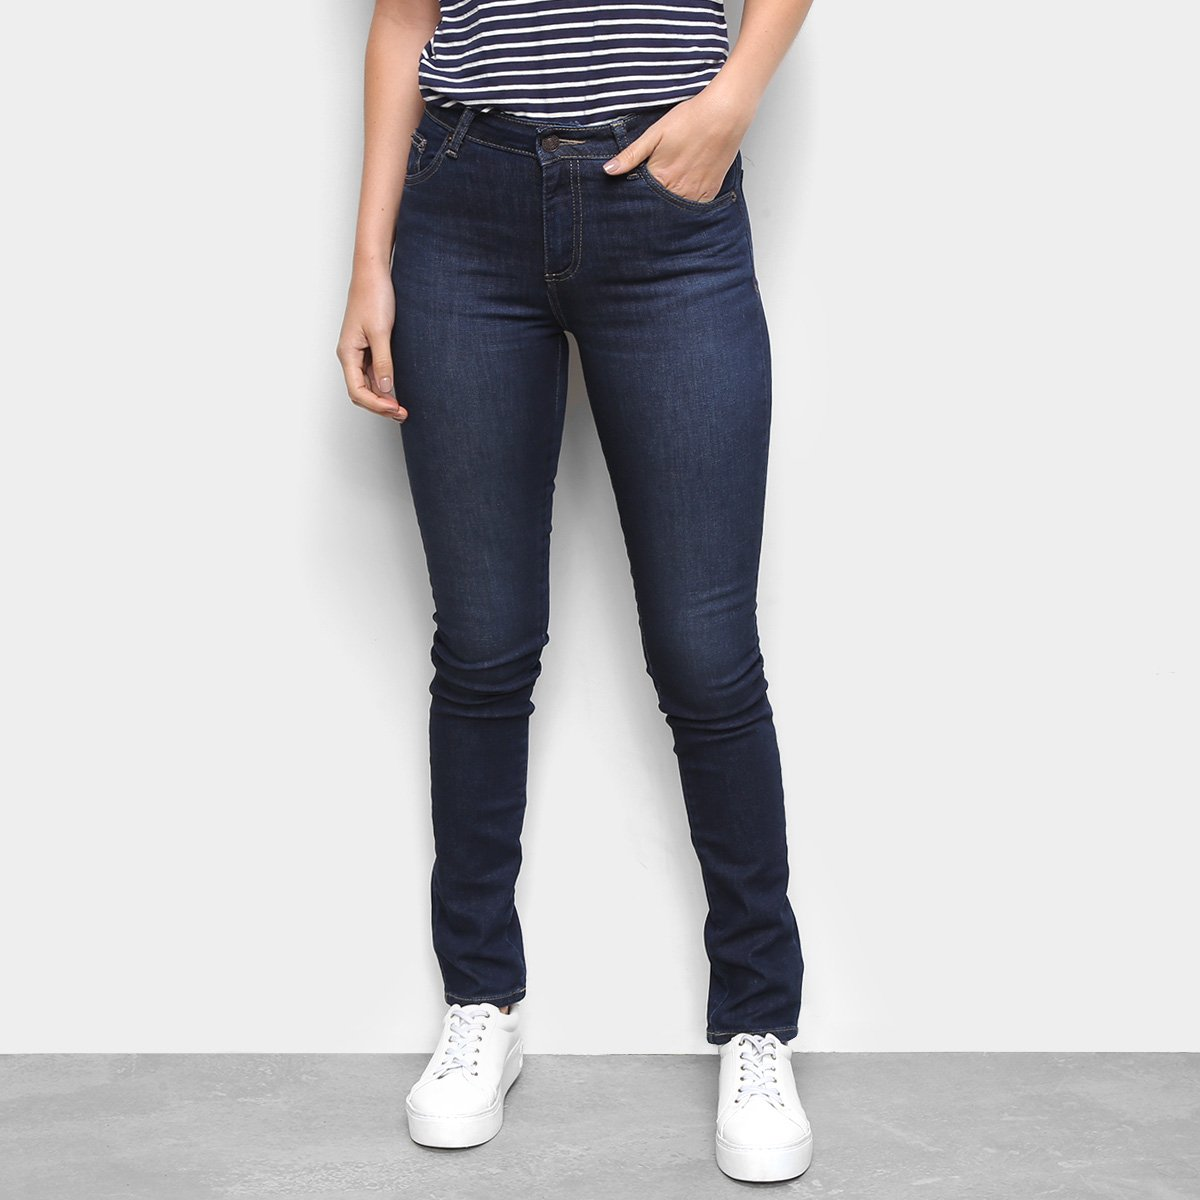 Calça Jeans Lacoste Skinny Escura Feminina